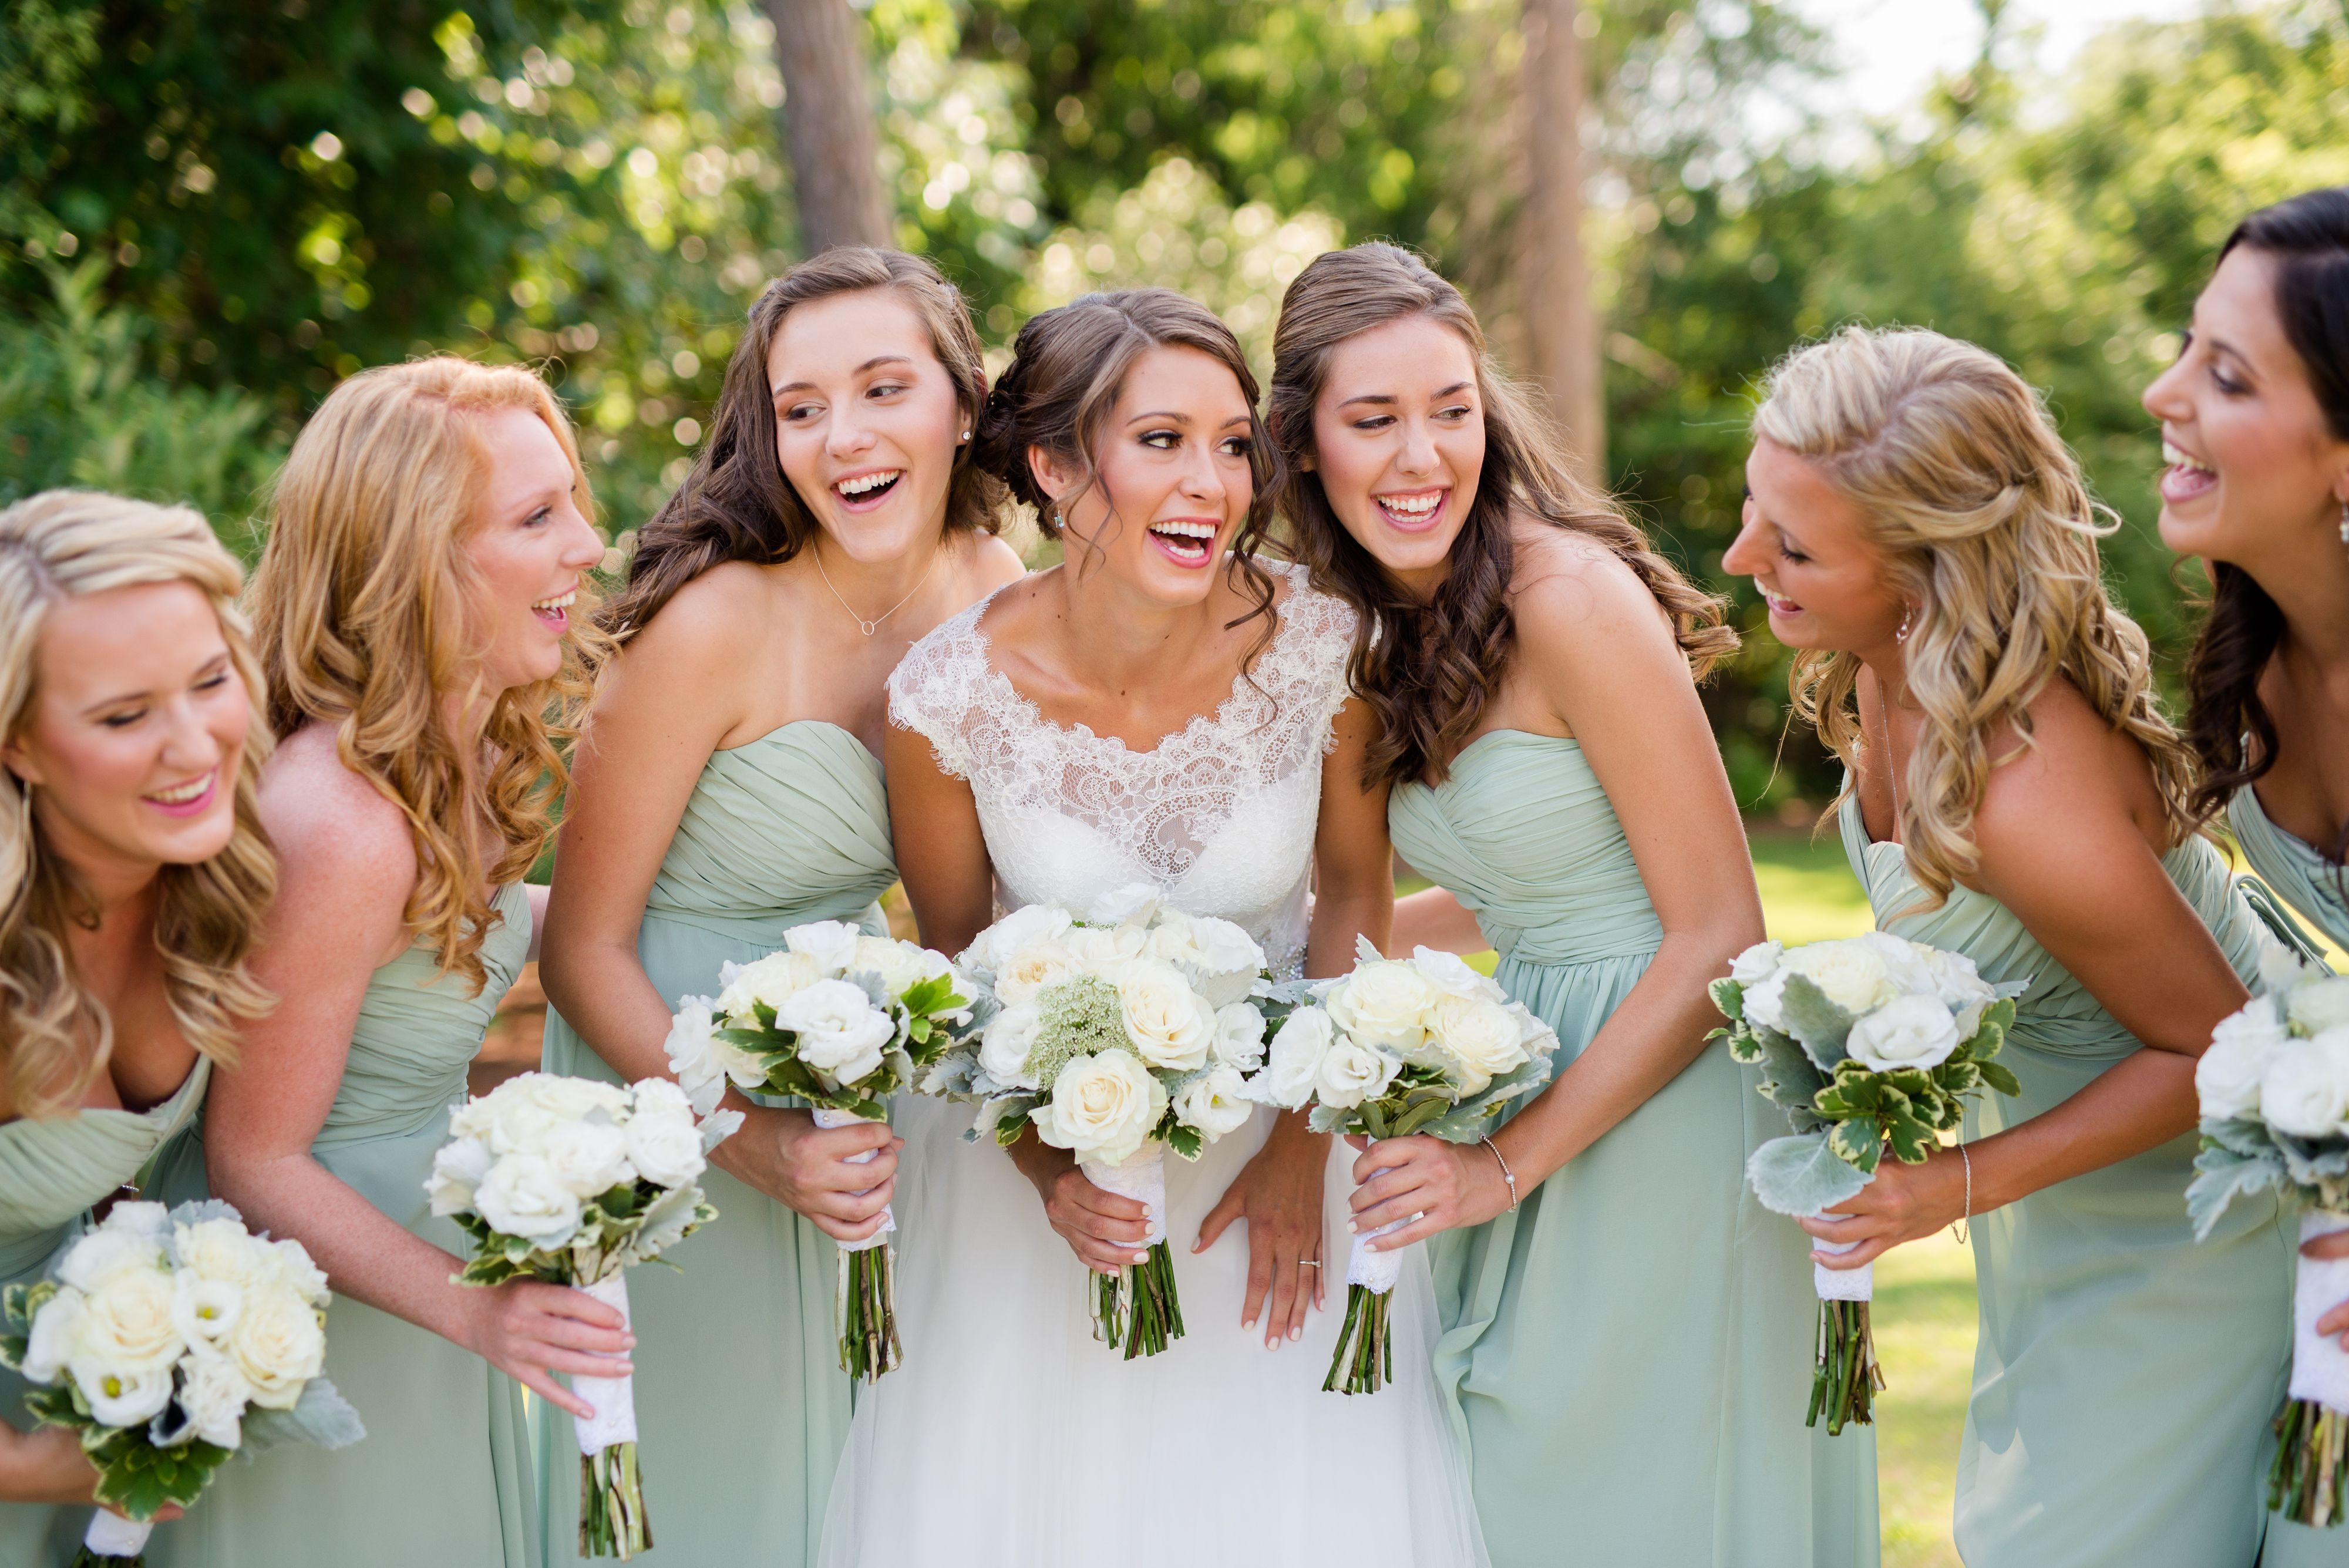 Bill levkoff sage chiffon bridesmaid dresses s and k get hitched bill levkoff sage chiffon bridesmaid dresses ombrellifo Choice Image